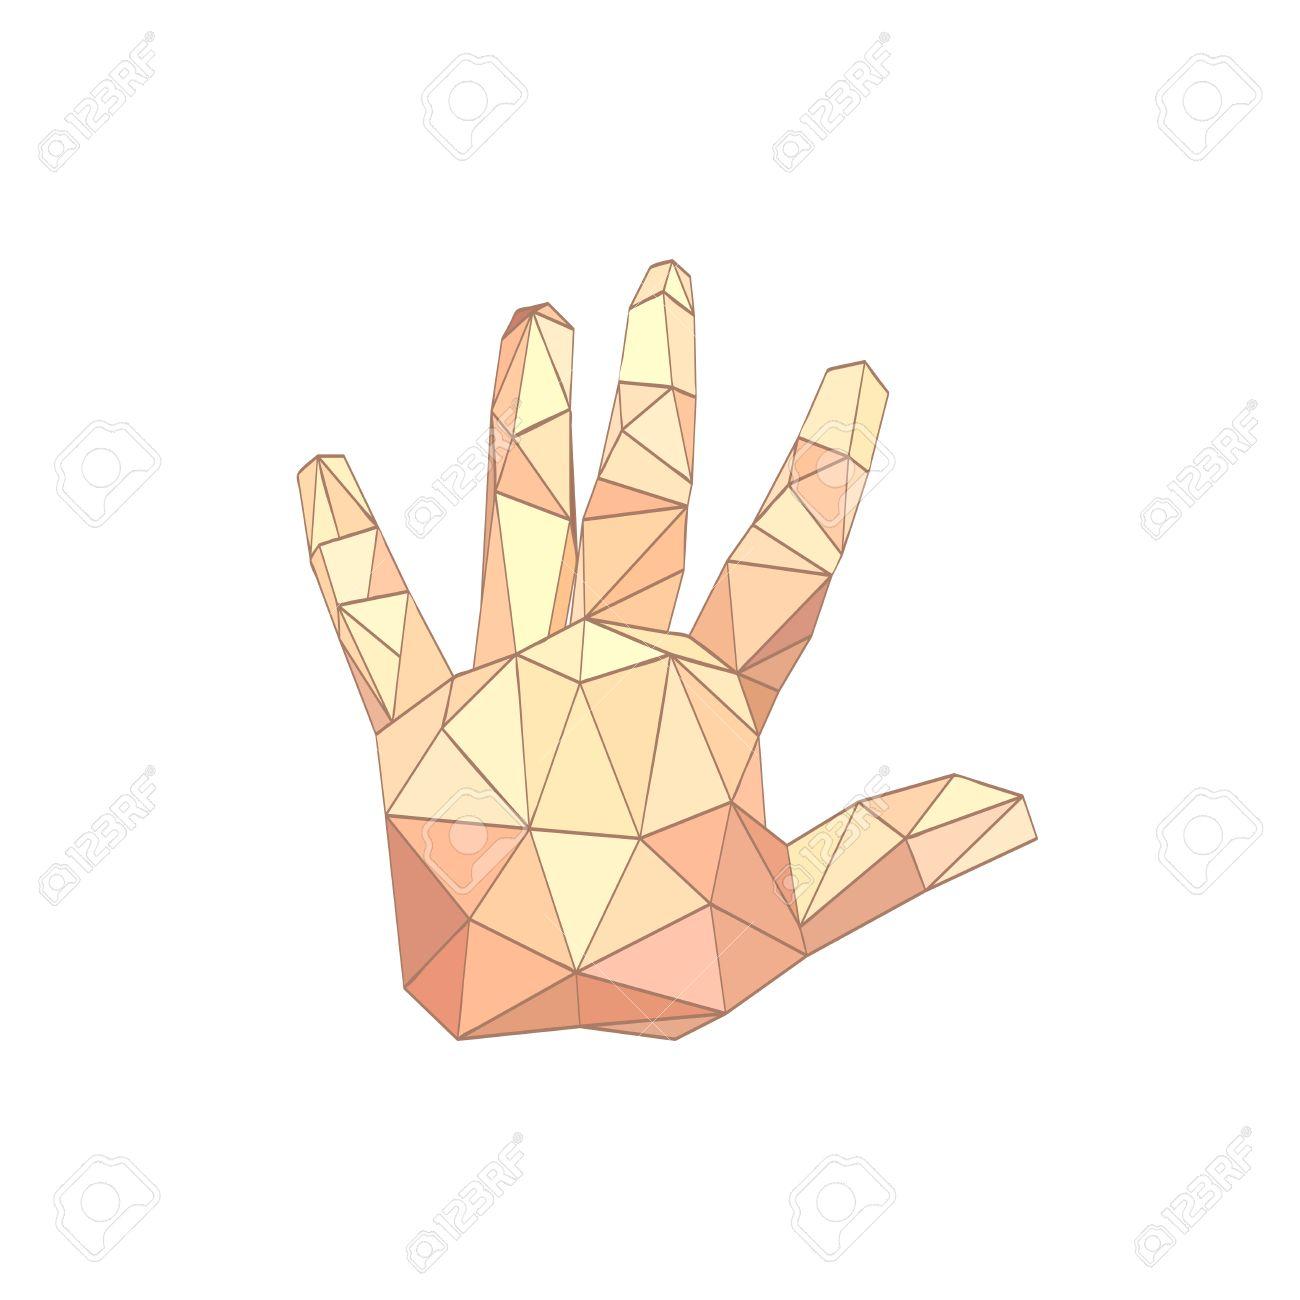 Origami Skeleton Hand : 7 Steps - Instructables | 1300x1300